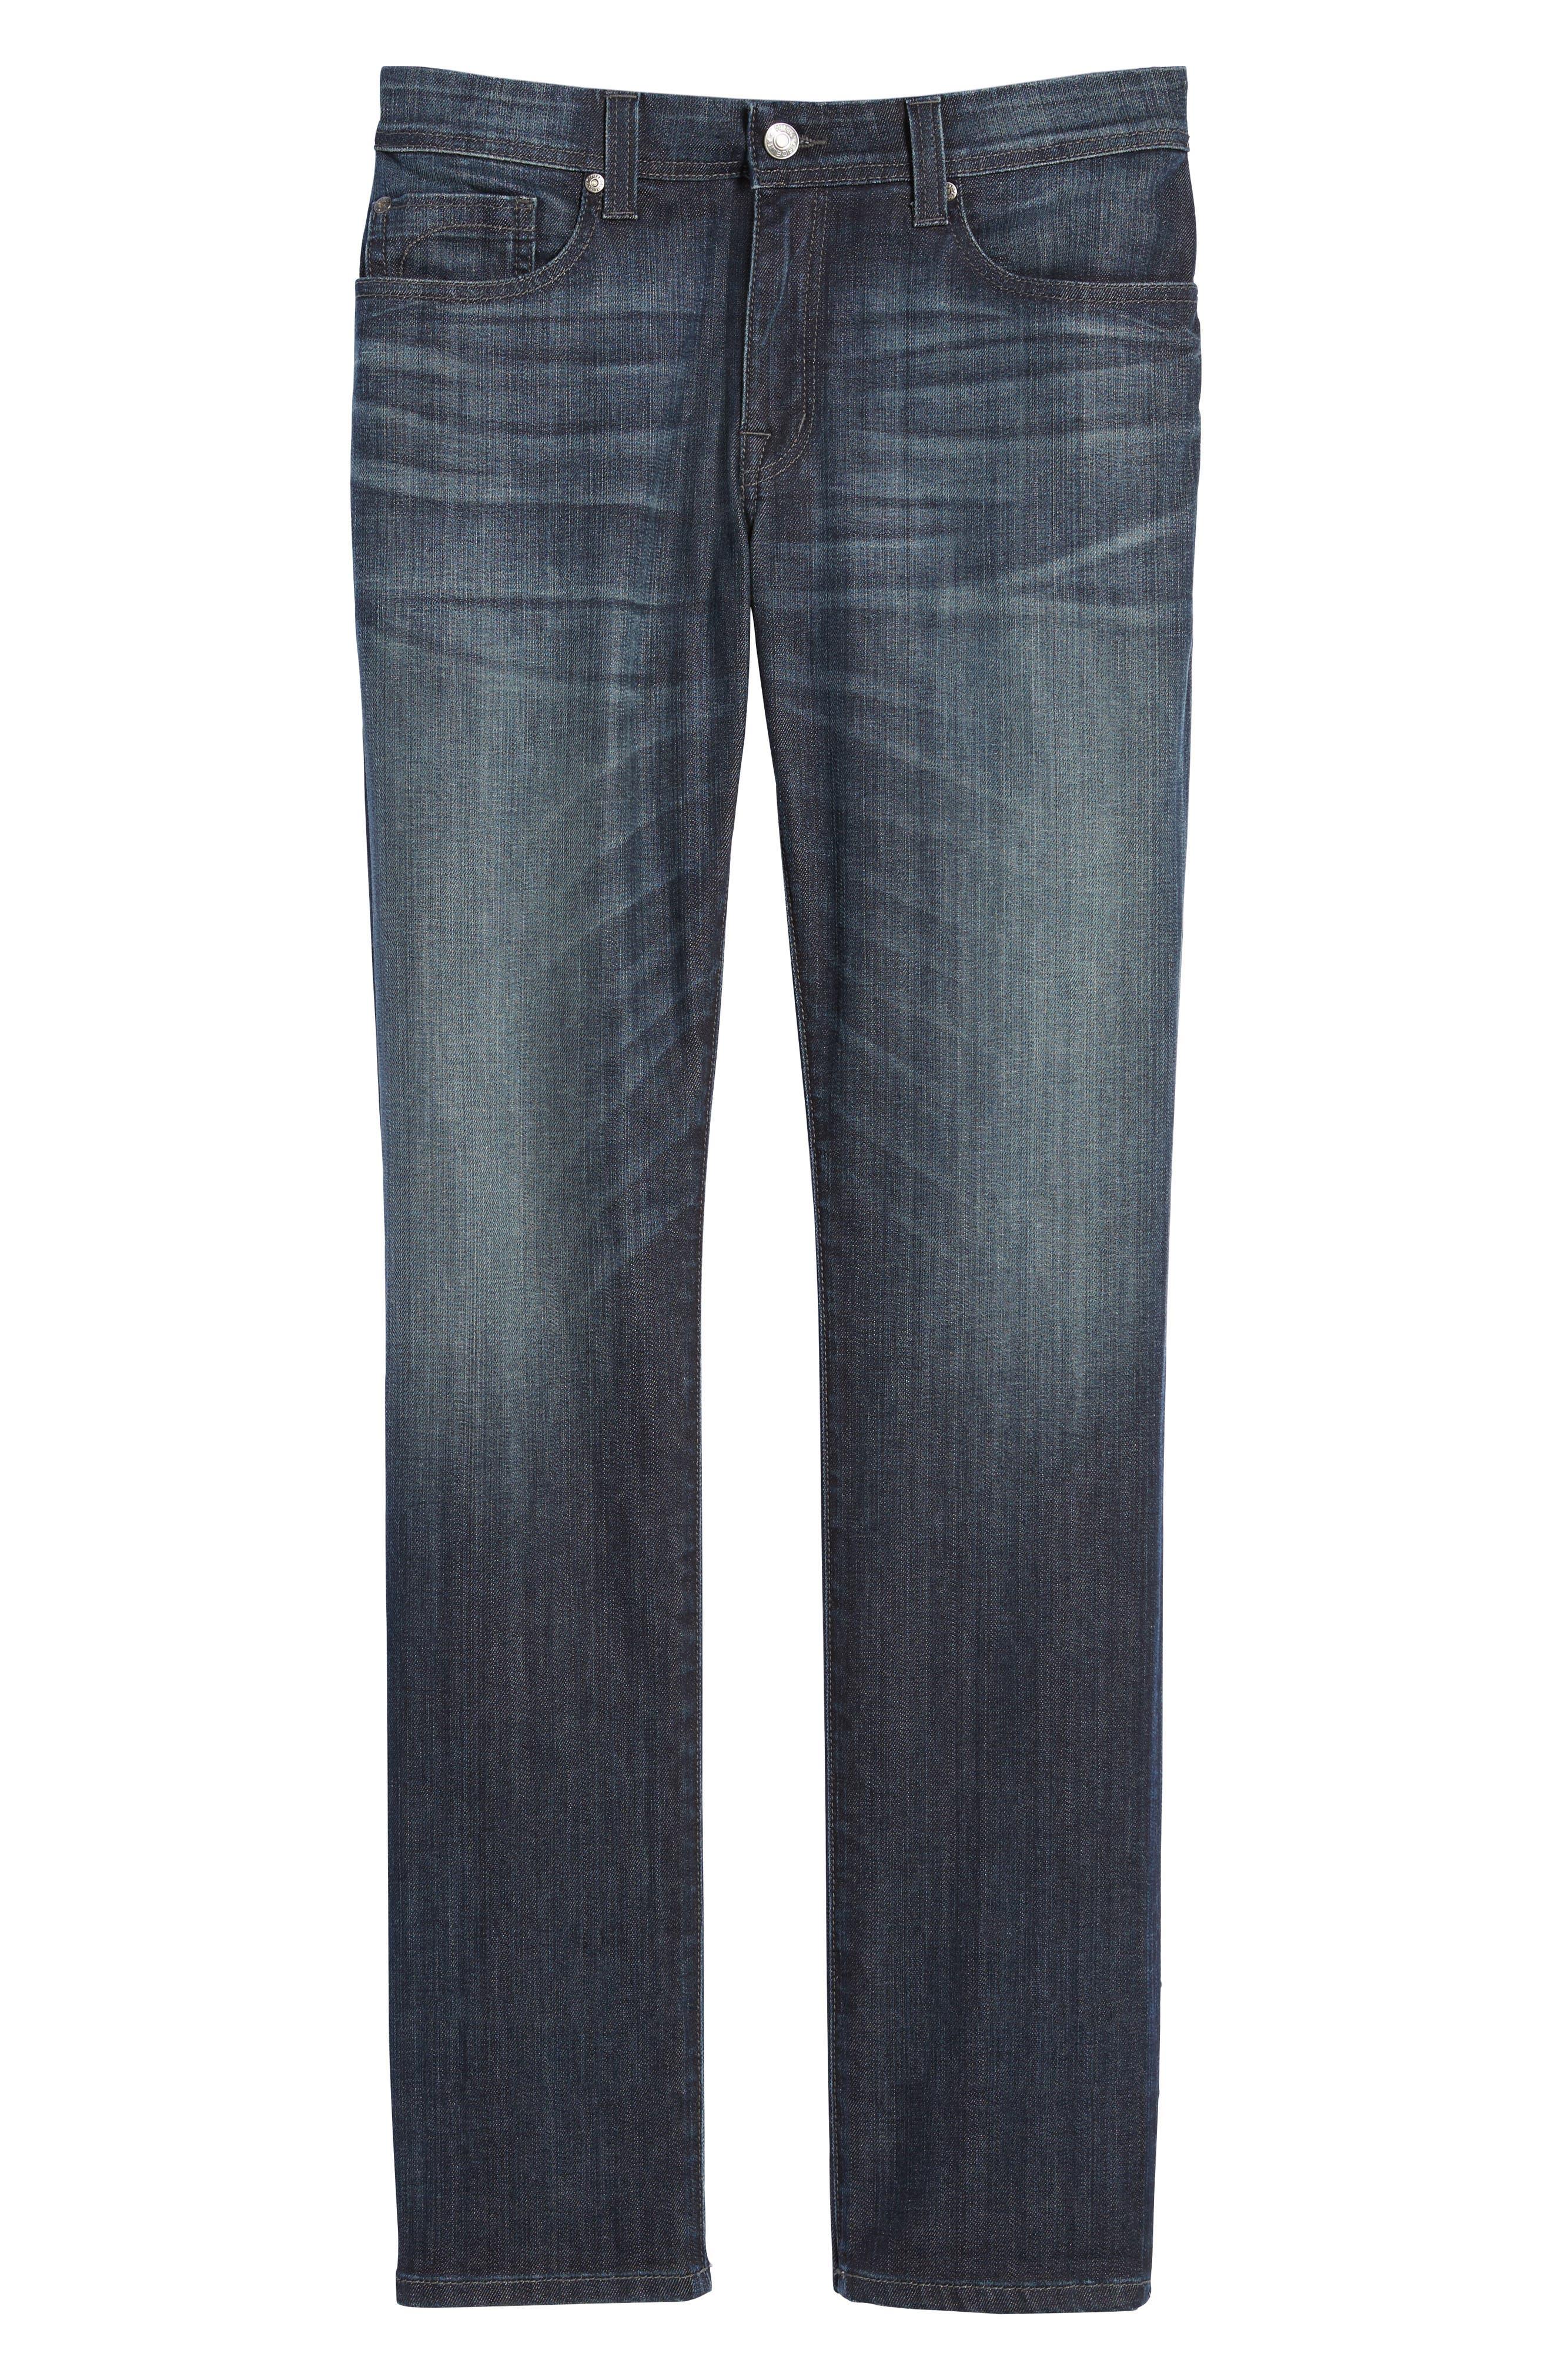 Jimmy Slim Straight Leg Jeans,                             Alternate thumbnail 7, color,                             Scorpion